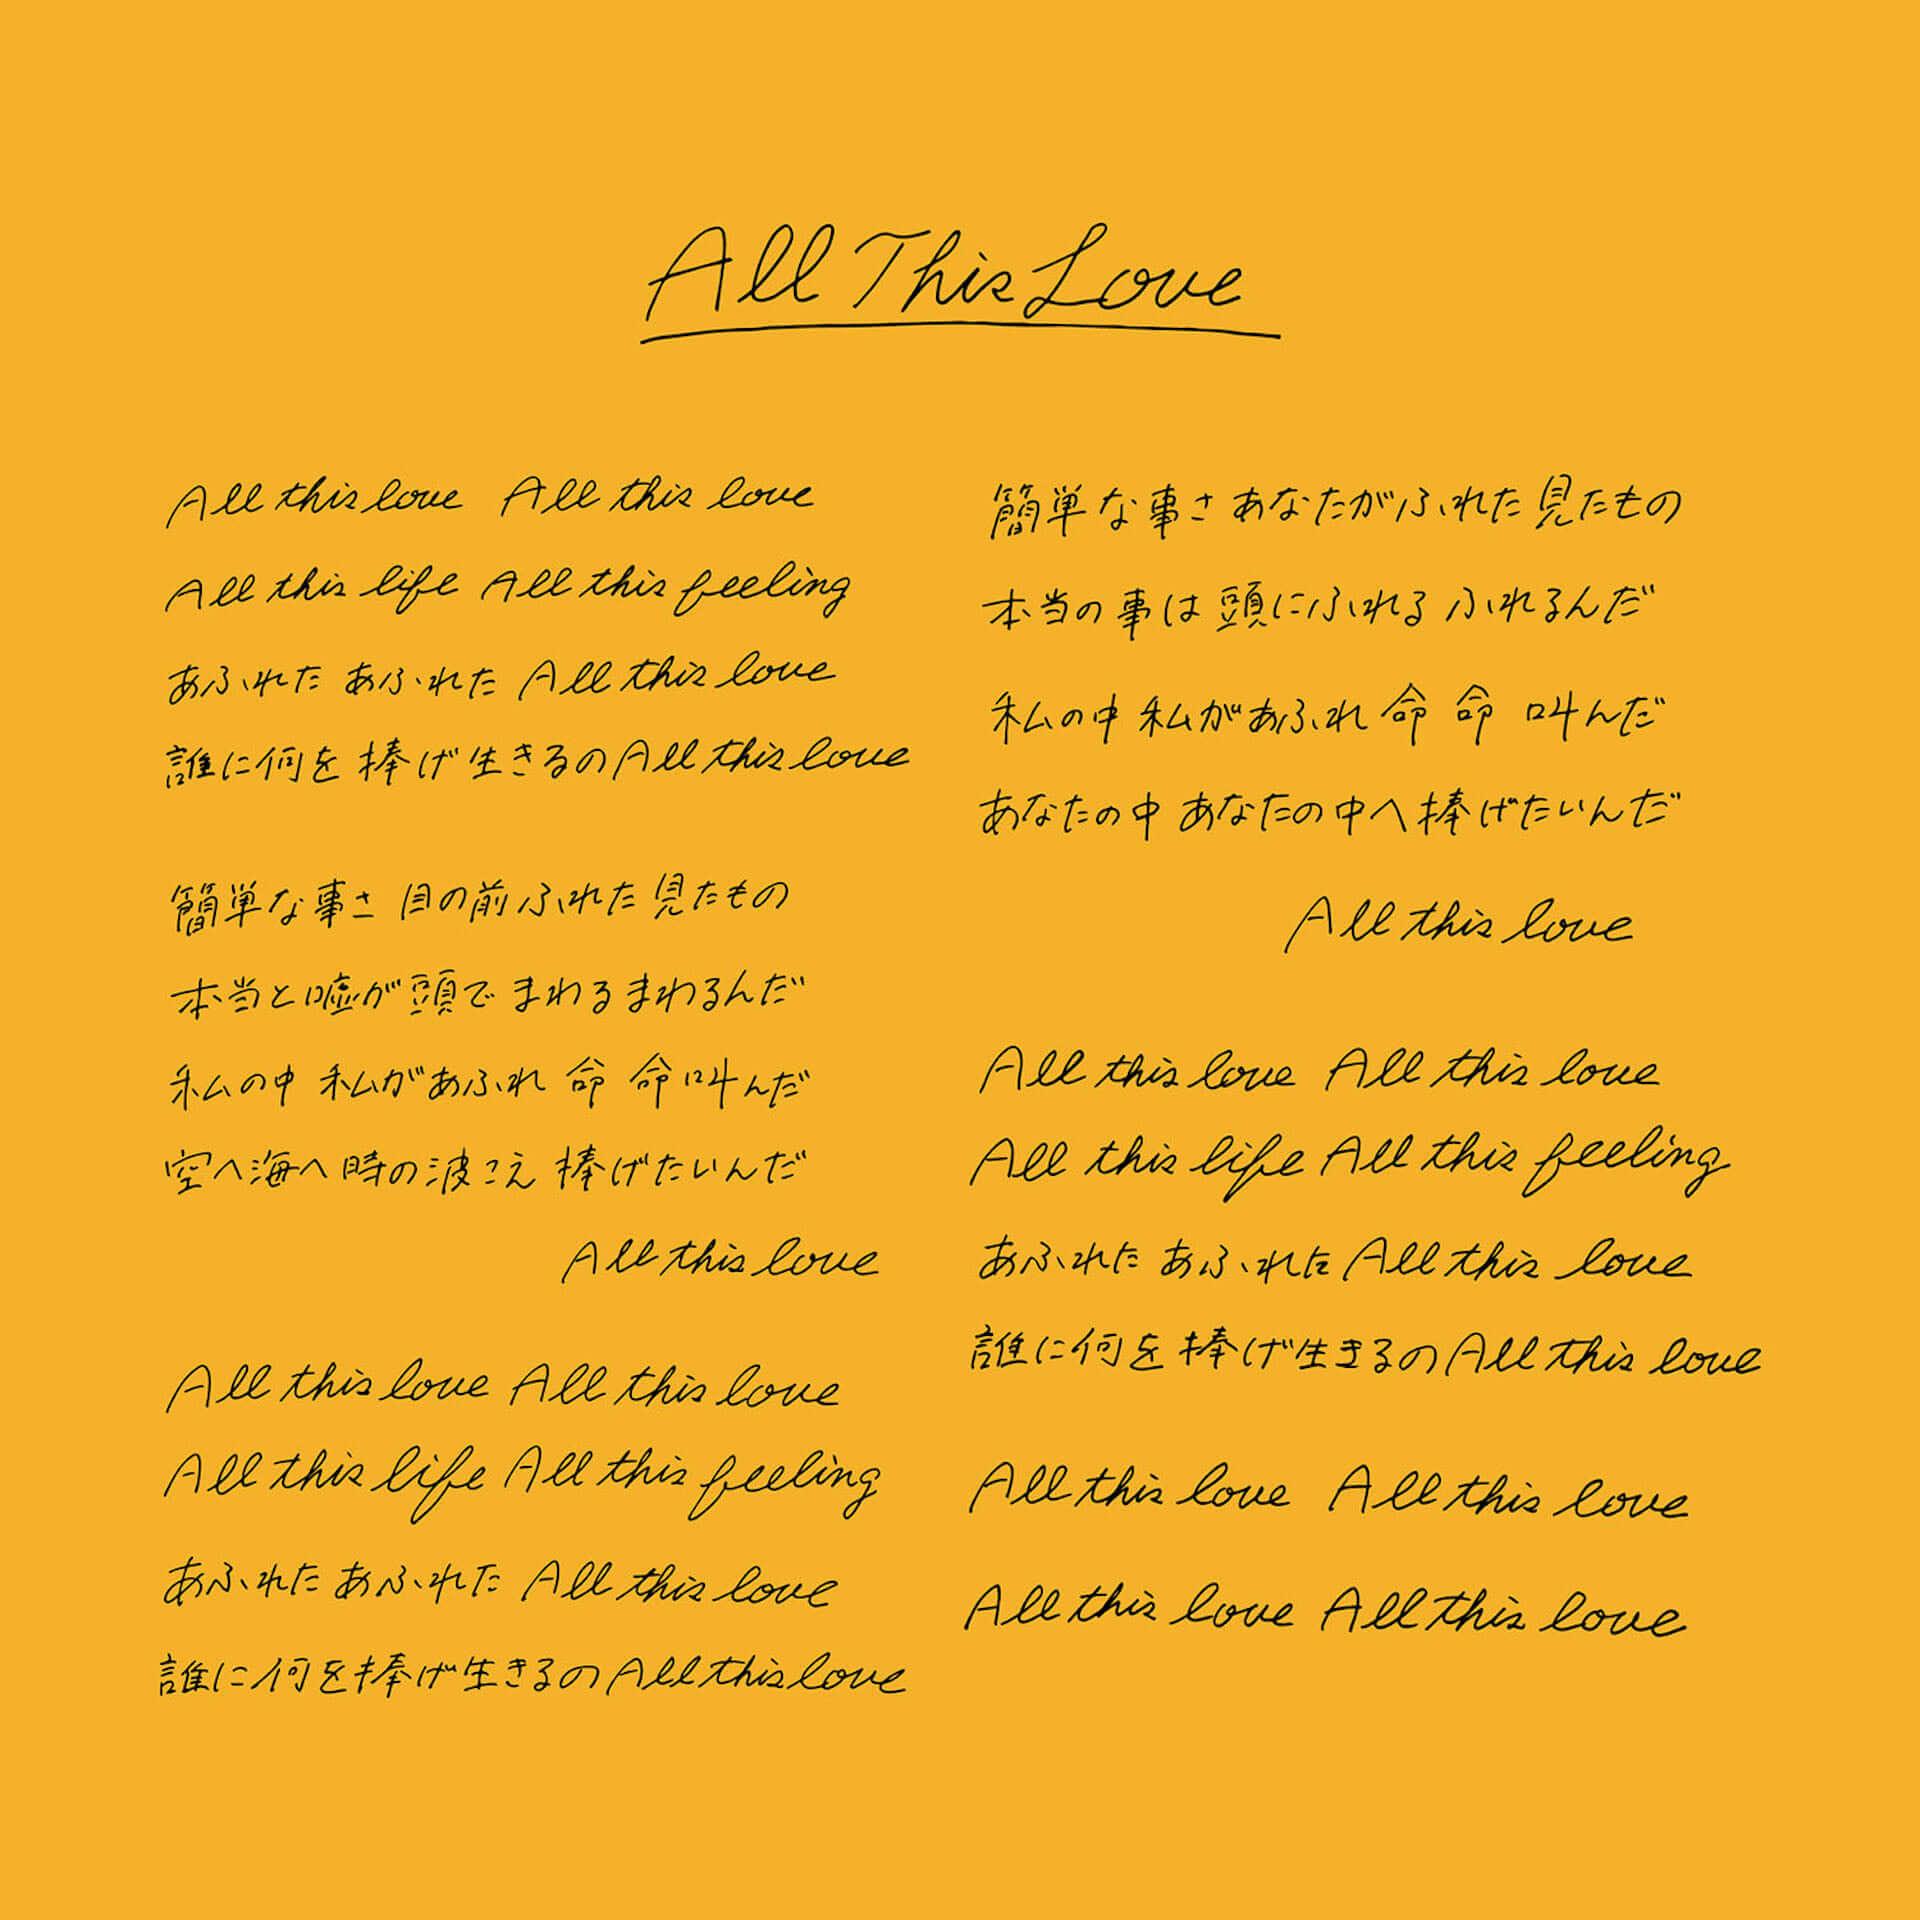 KONCOSの最新アルバムから新曲が連続配信決定|「SaveOurSpace」へのメッセージを込めたMVと共に第1弾が公開 music200520_koncos_release_2-1920x1920